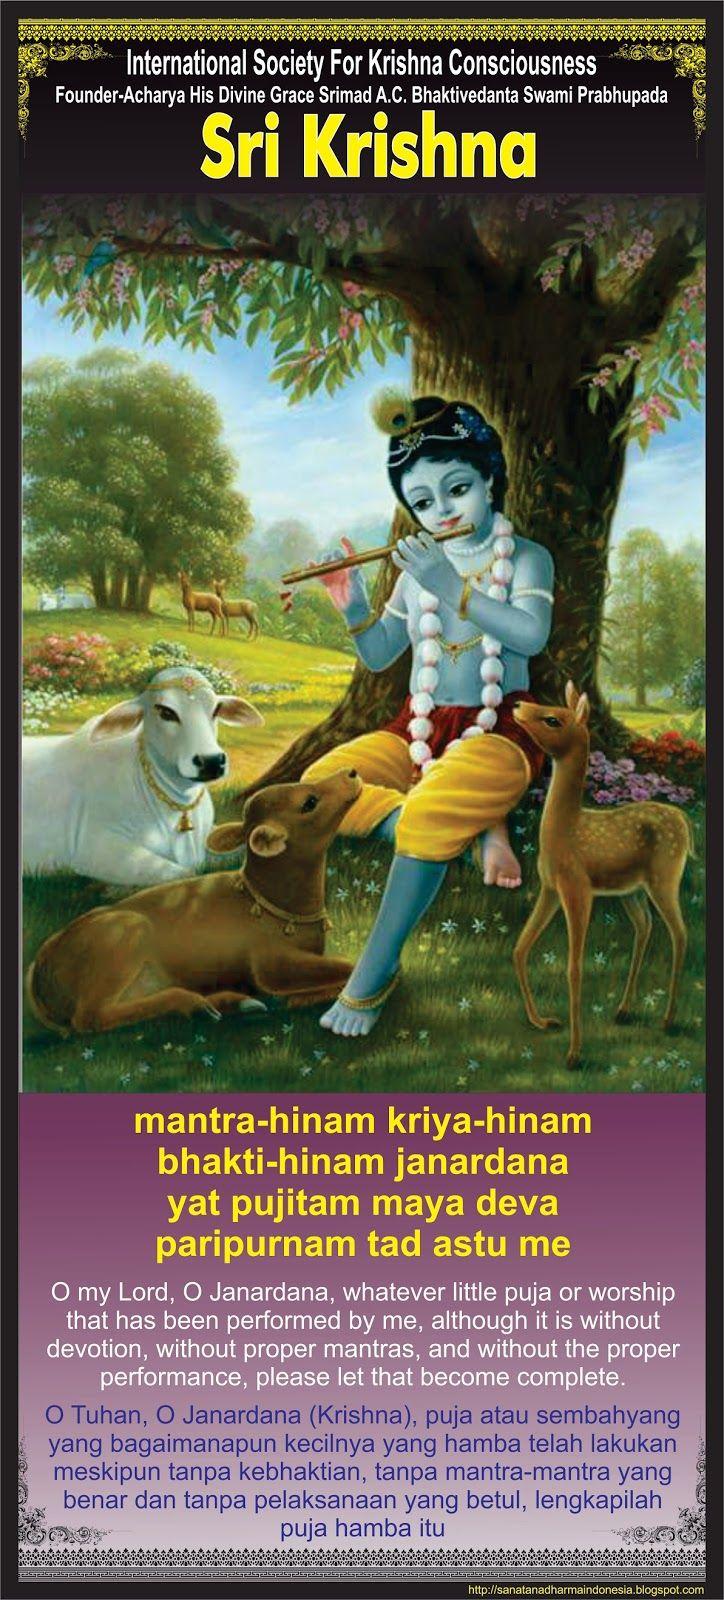 "Sanatana Dharma Indonesia: ""Doa Permintaan Maaf Pada Sri Krishna (Lanjutan)"""